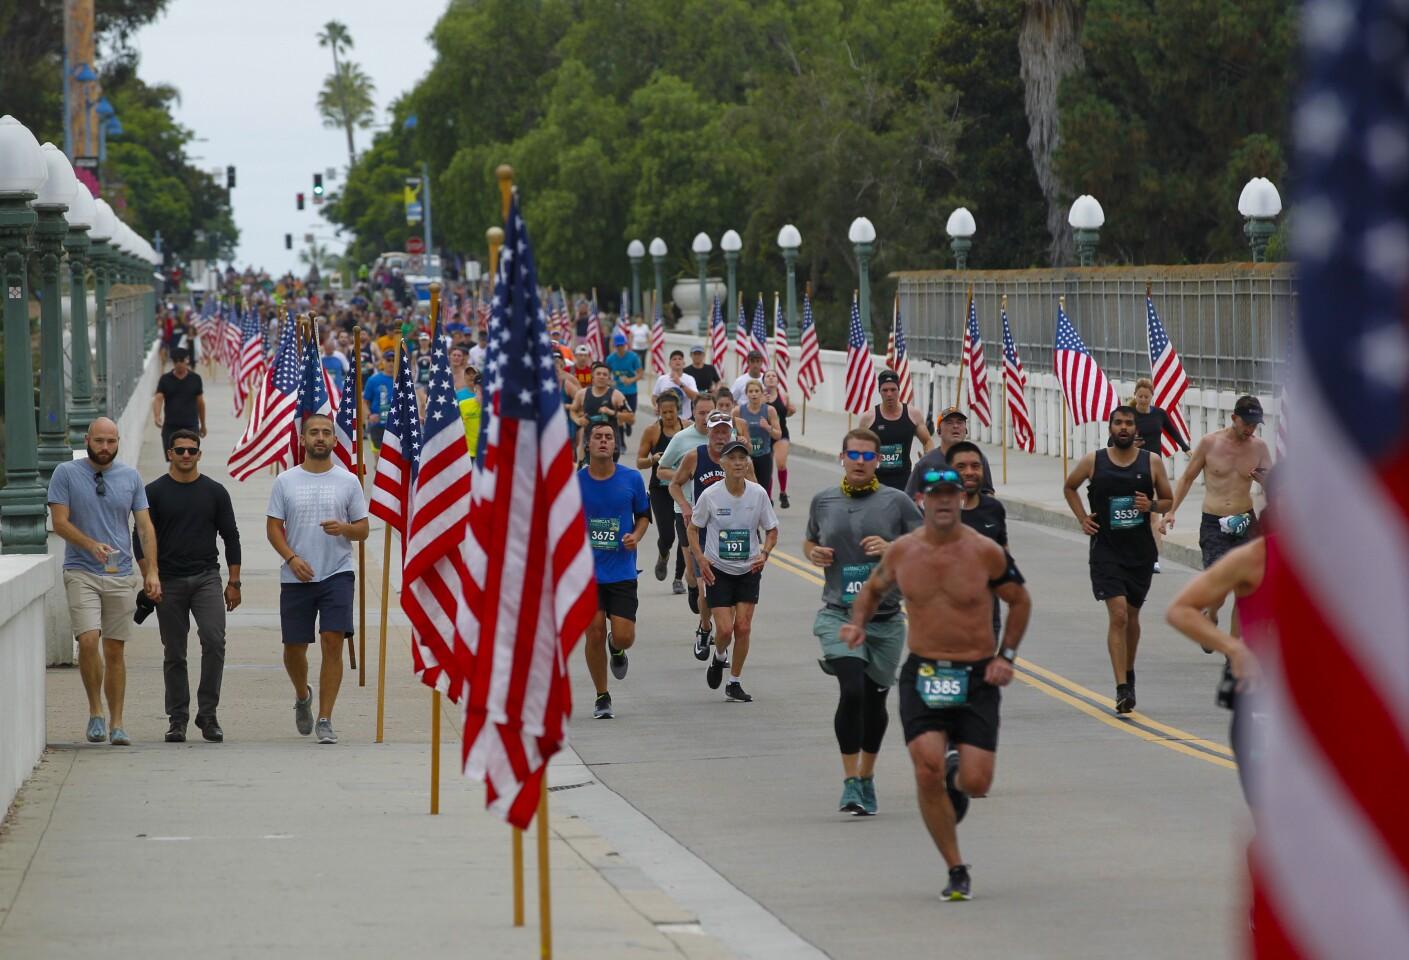 America's Finest City Half Marathon - The San Diego Union-Tribune